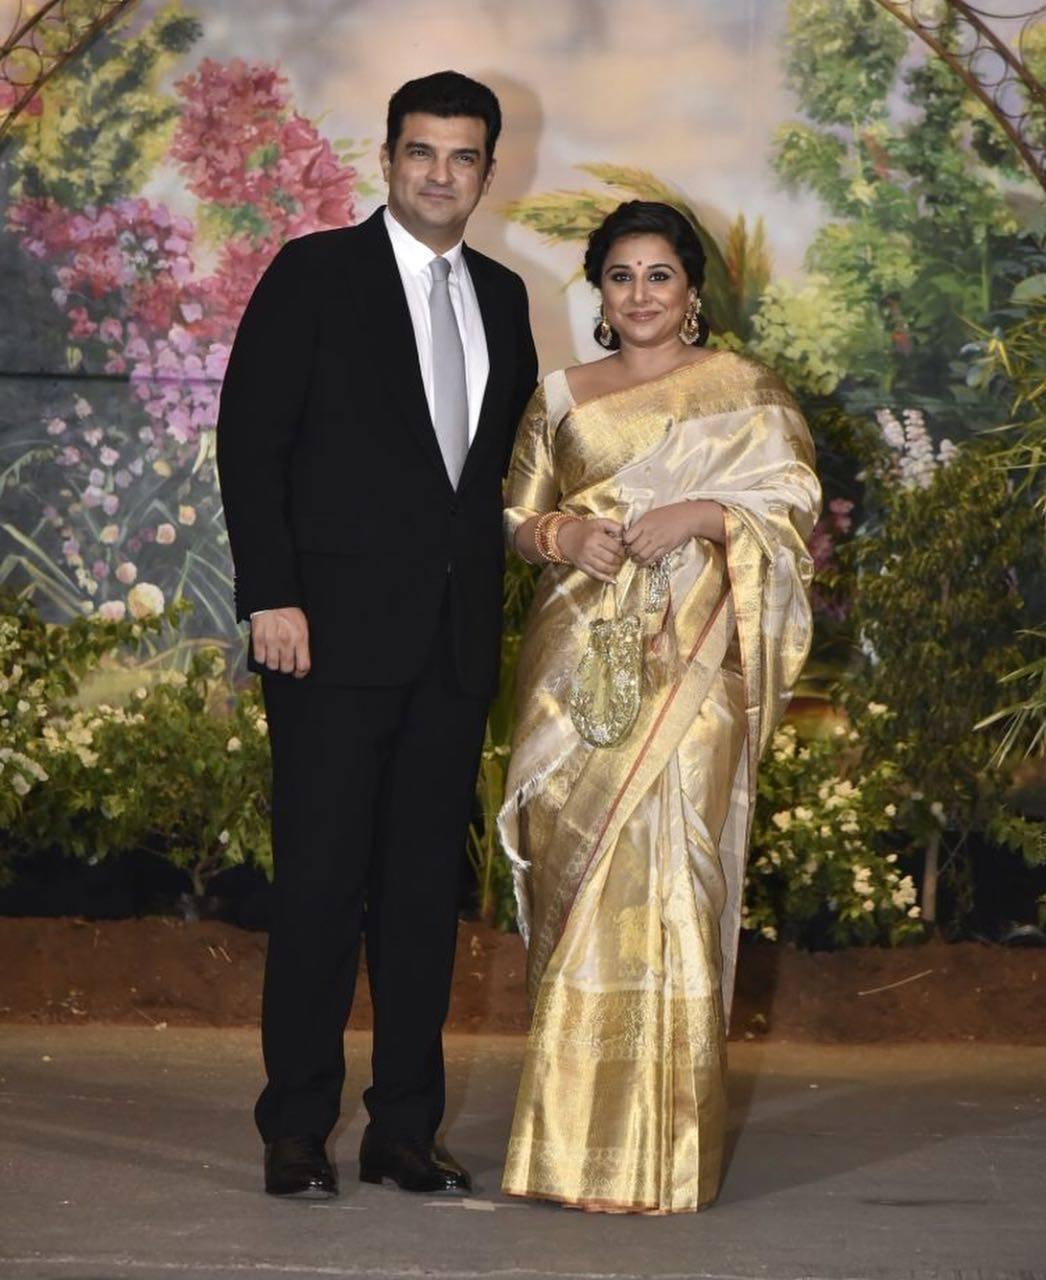 vidya balan and siddharth roy kapur photo from Sonam Kapoor reception